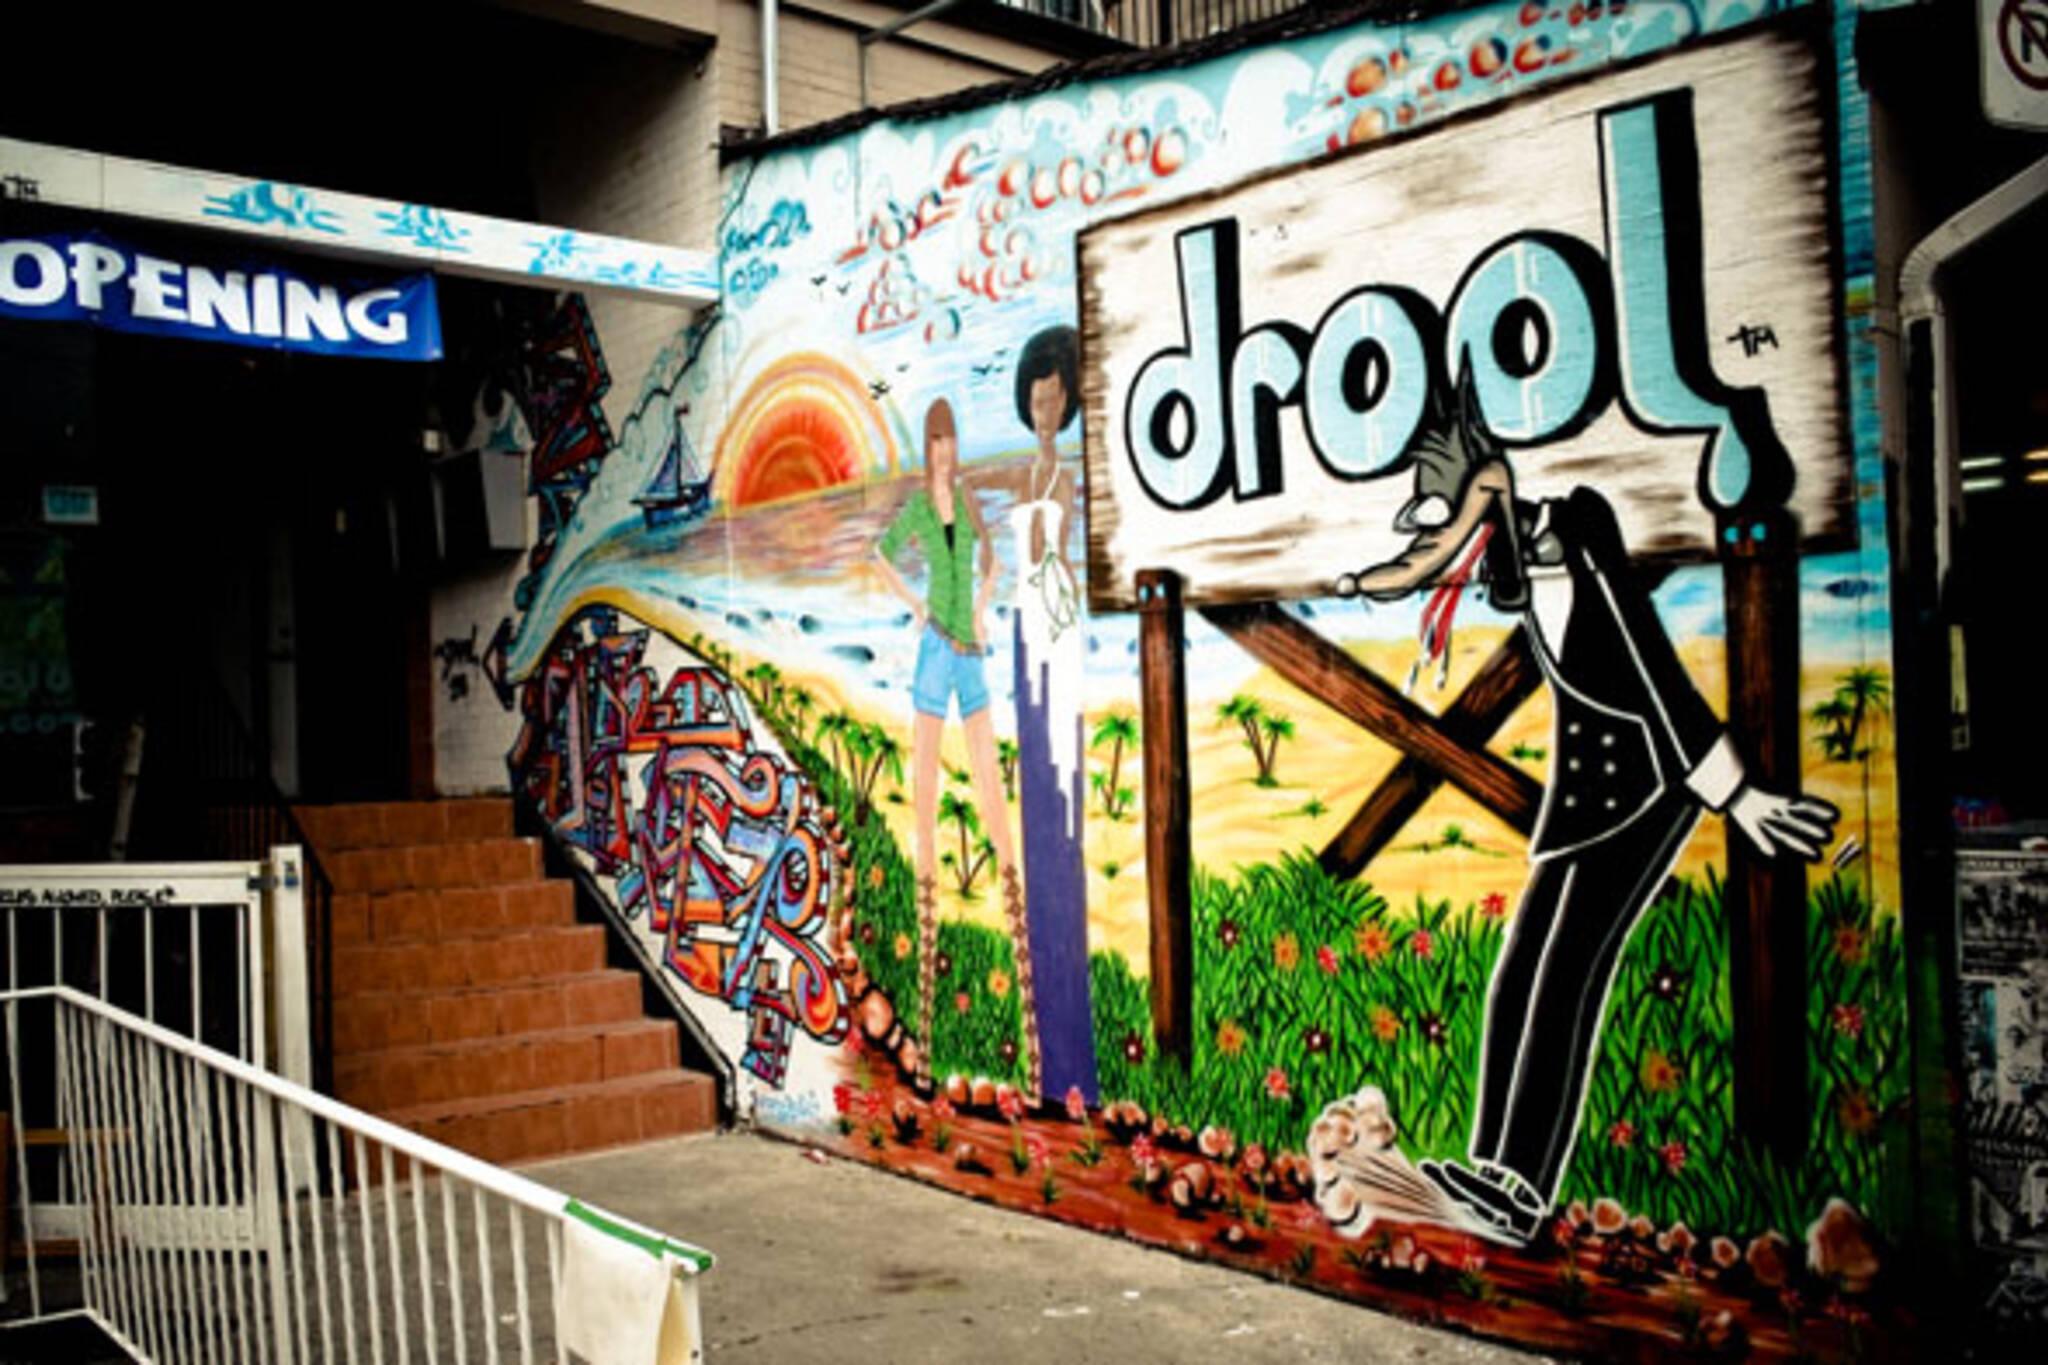 Drool Toronto